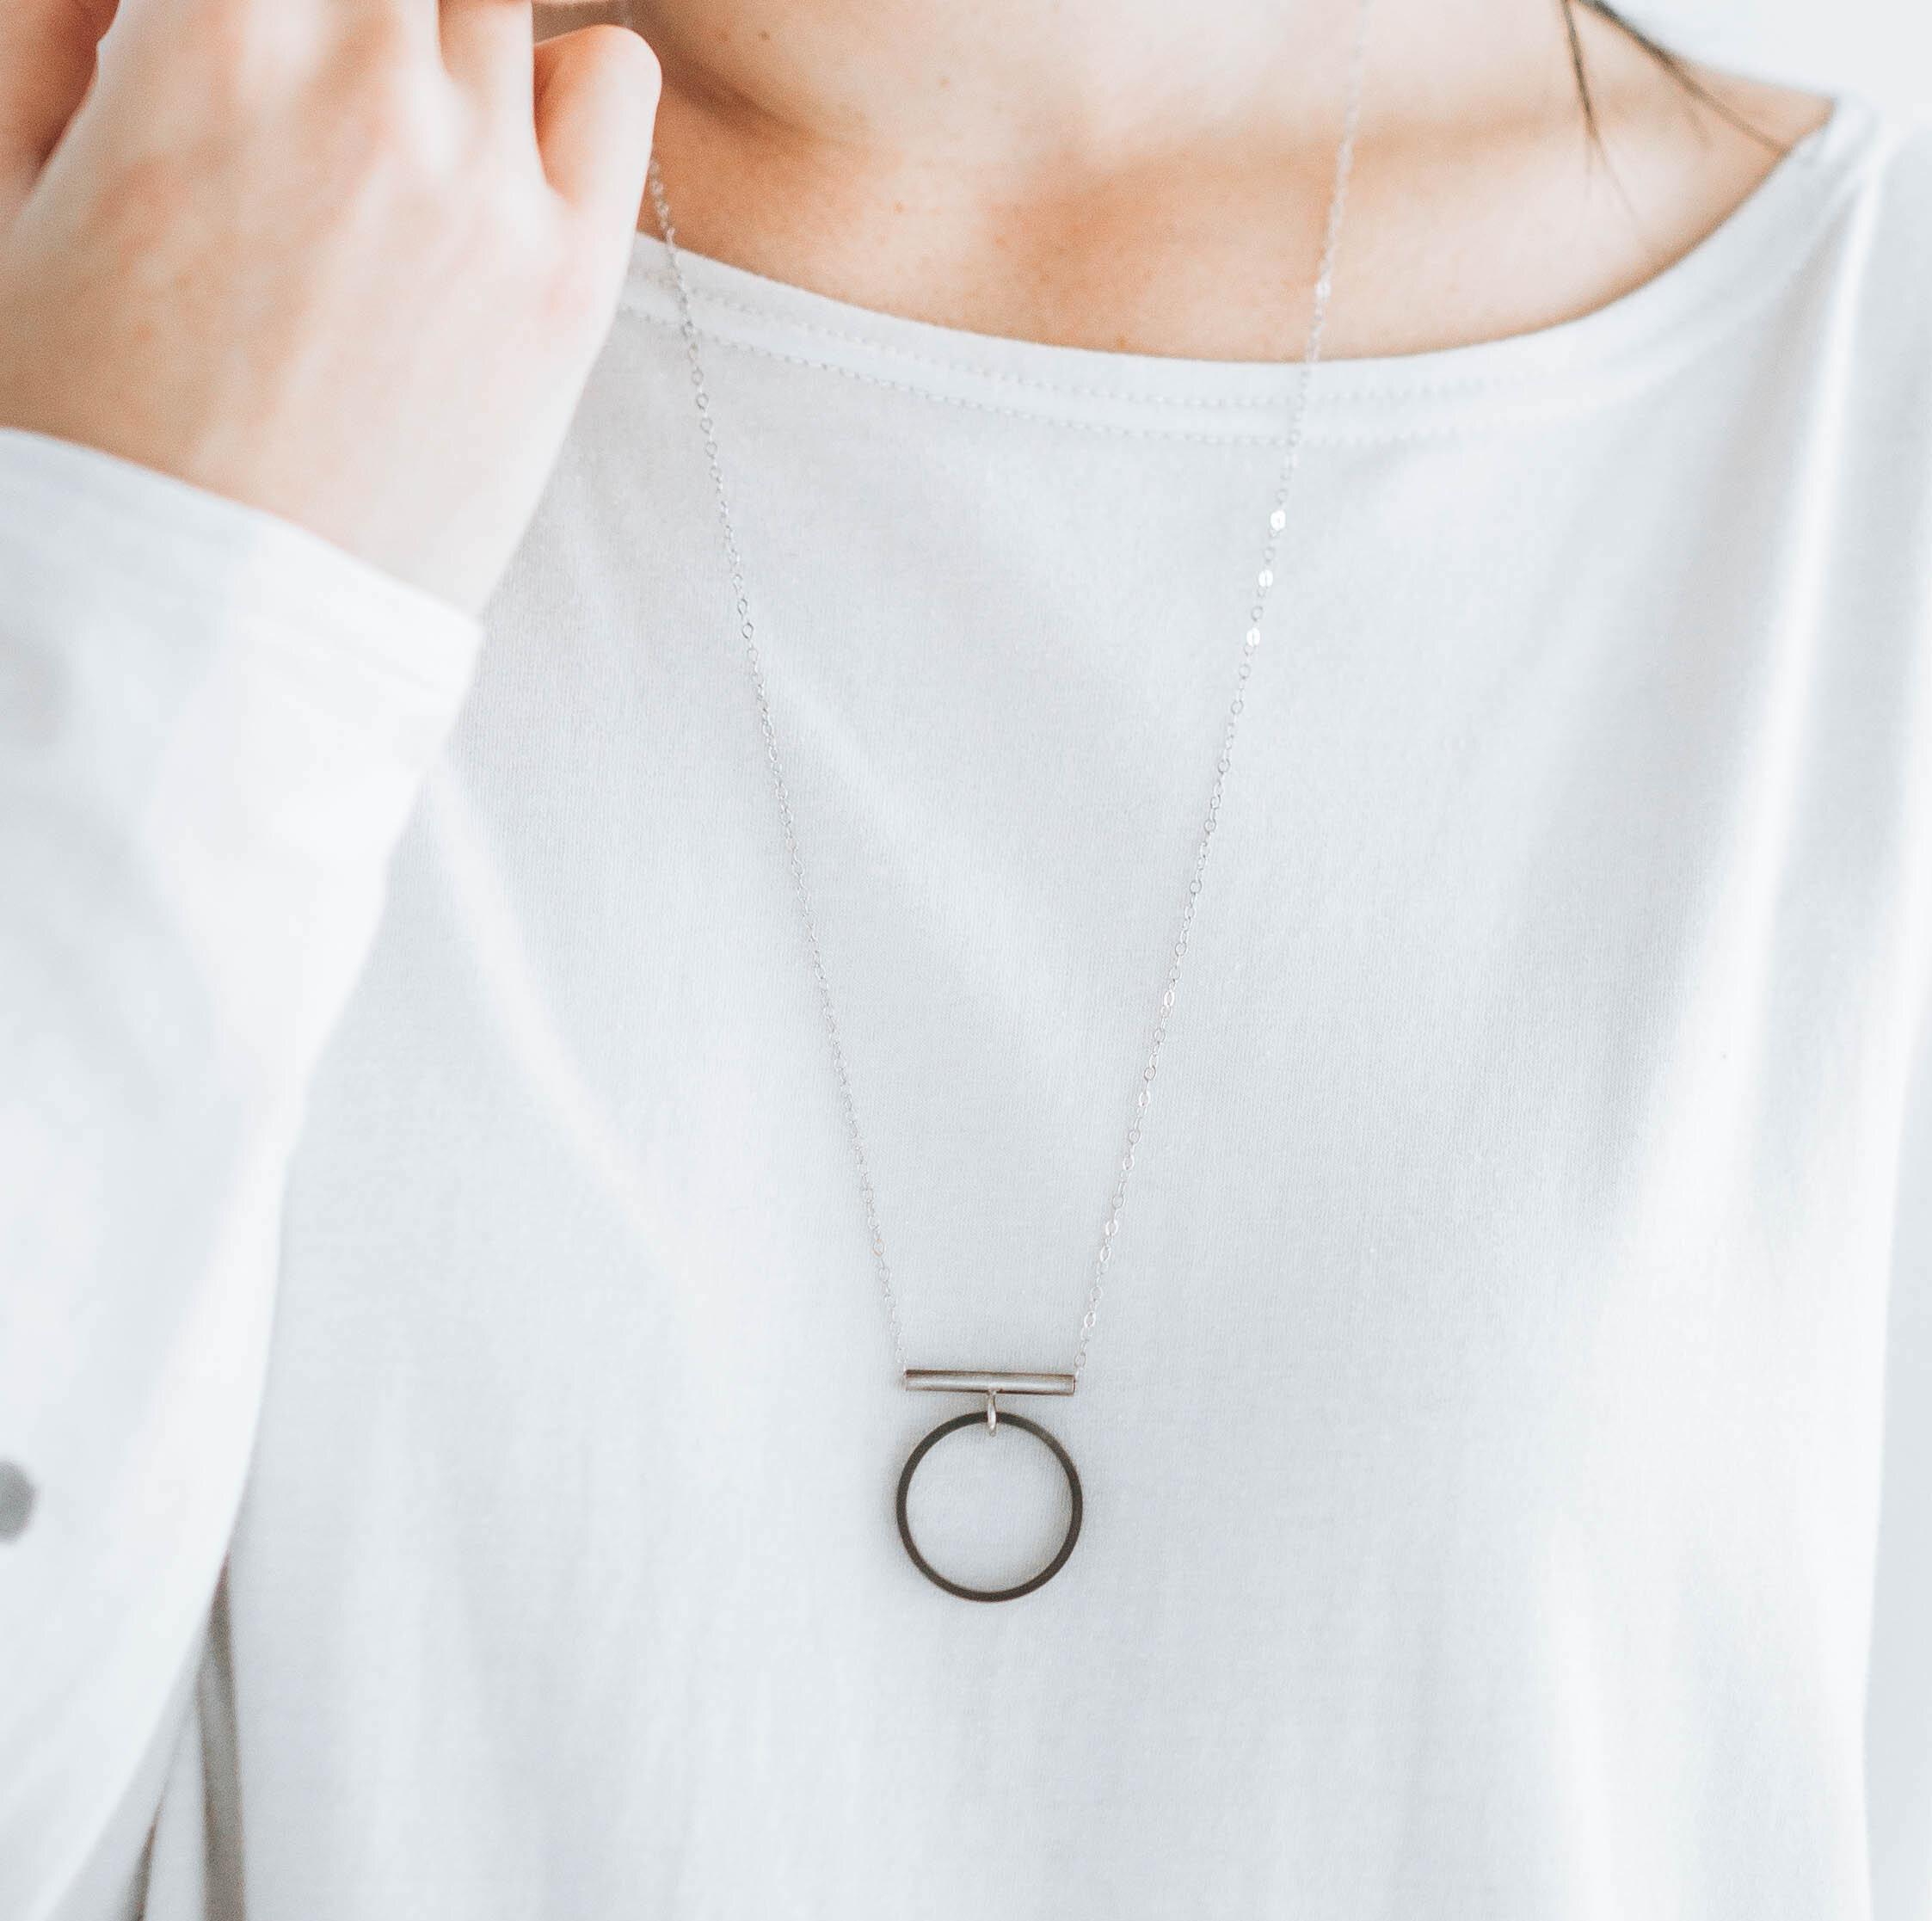 Black chain industrial geometric long necklace statement minimalist chain neklace